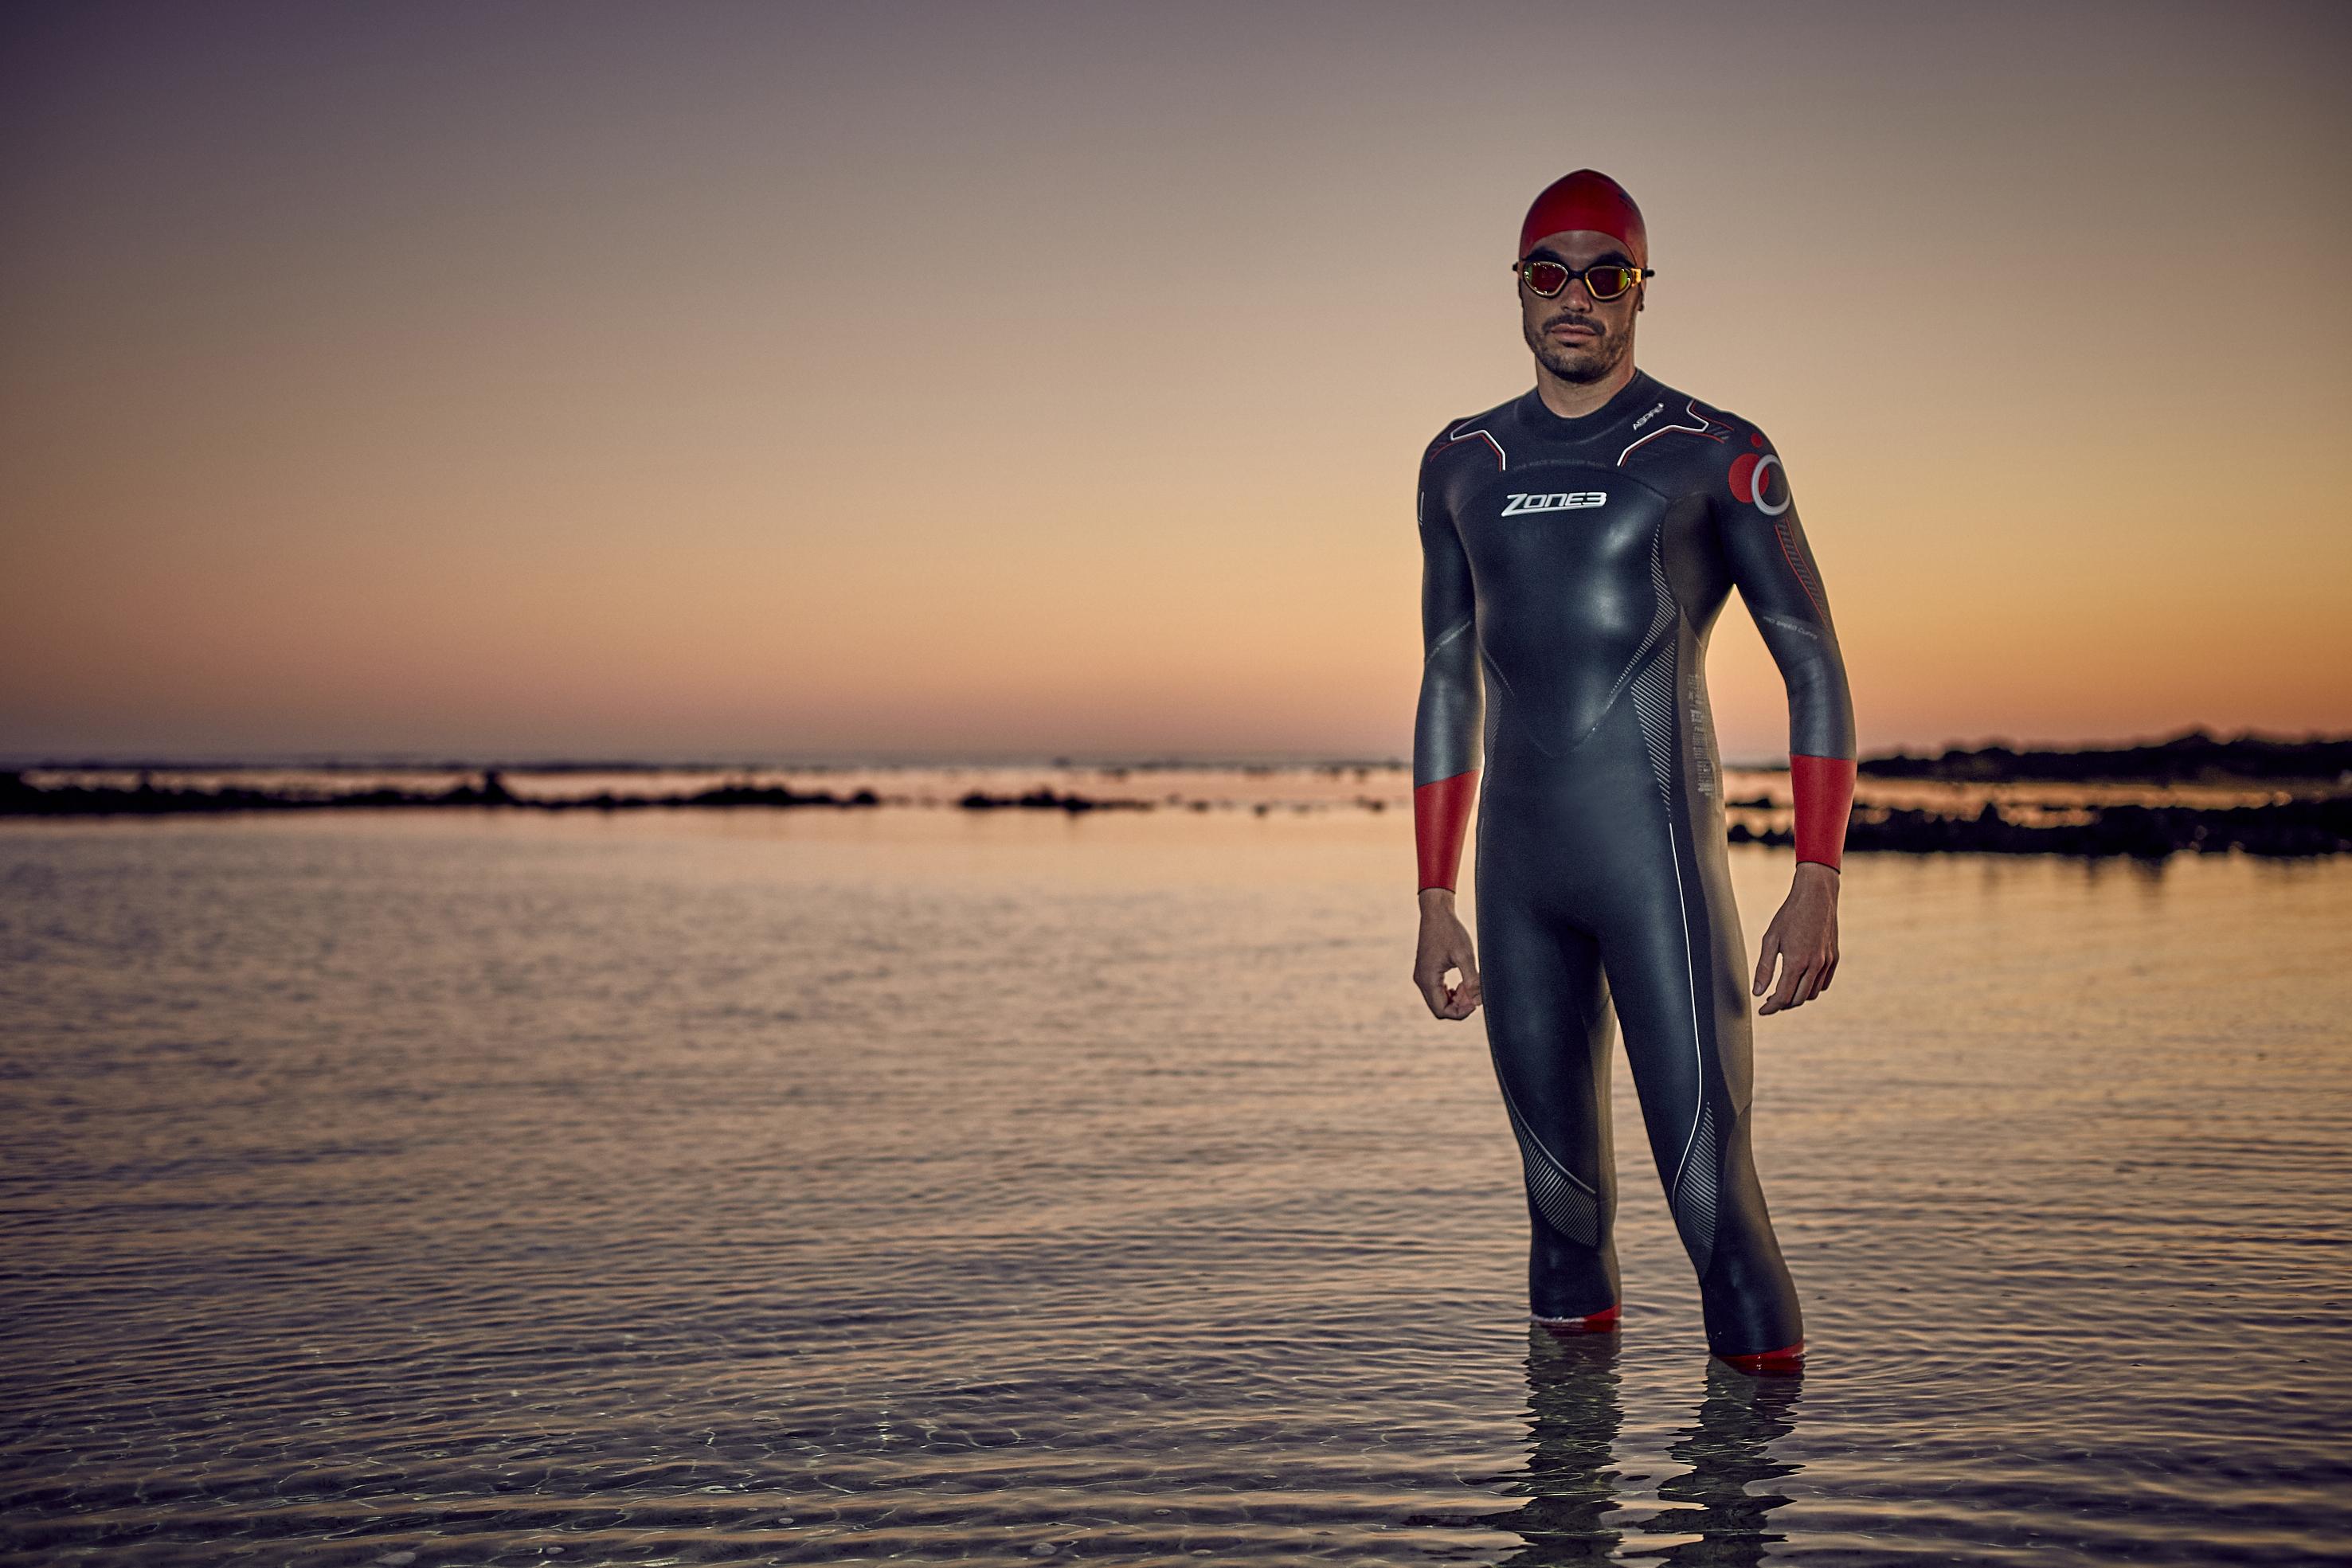 men-s-aspire-wetsuit-lifestyle-4-.jpg